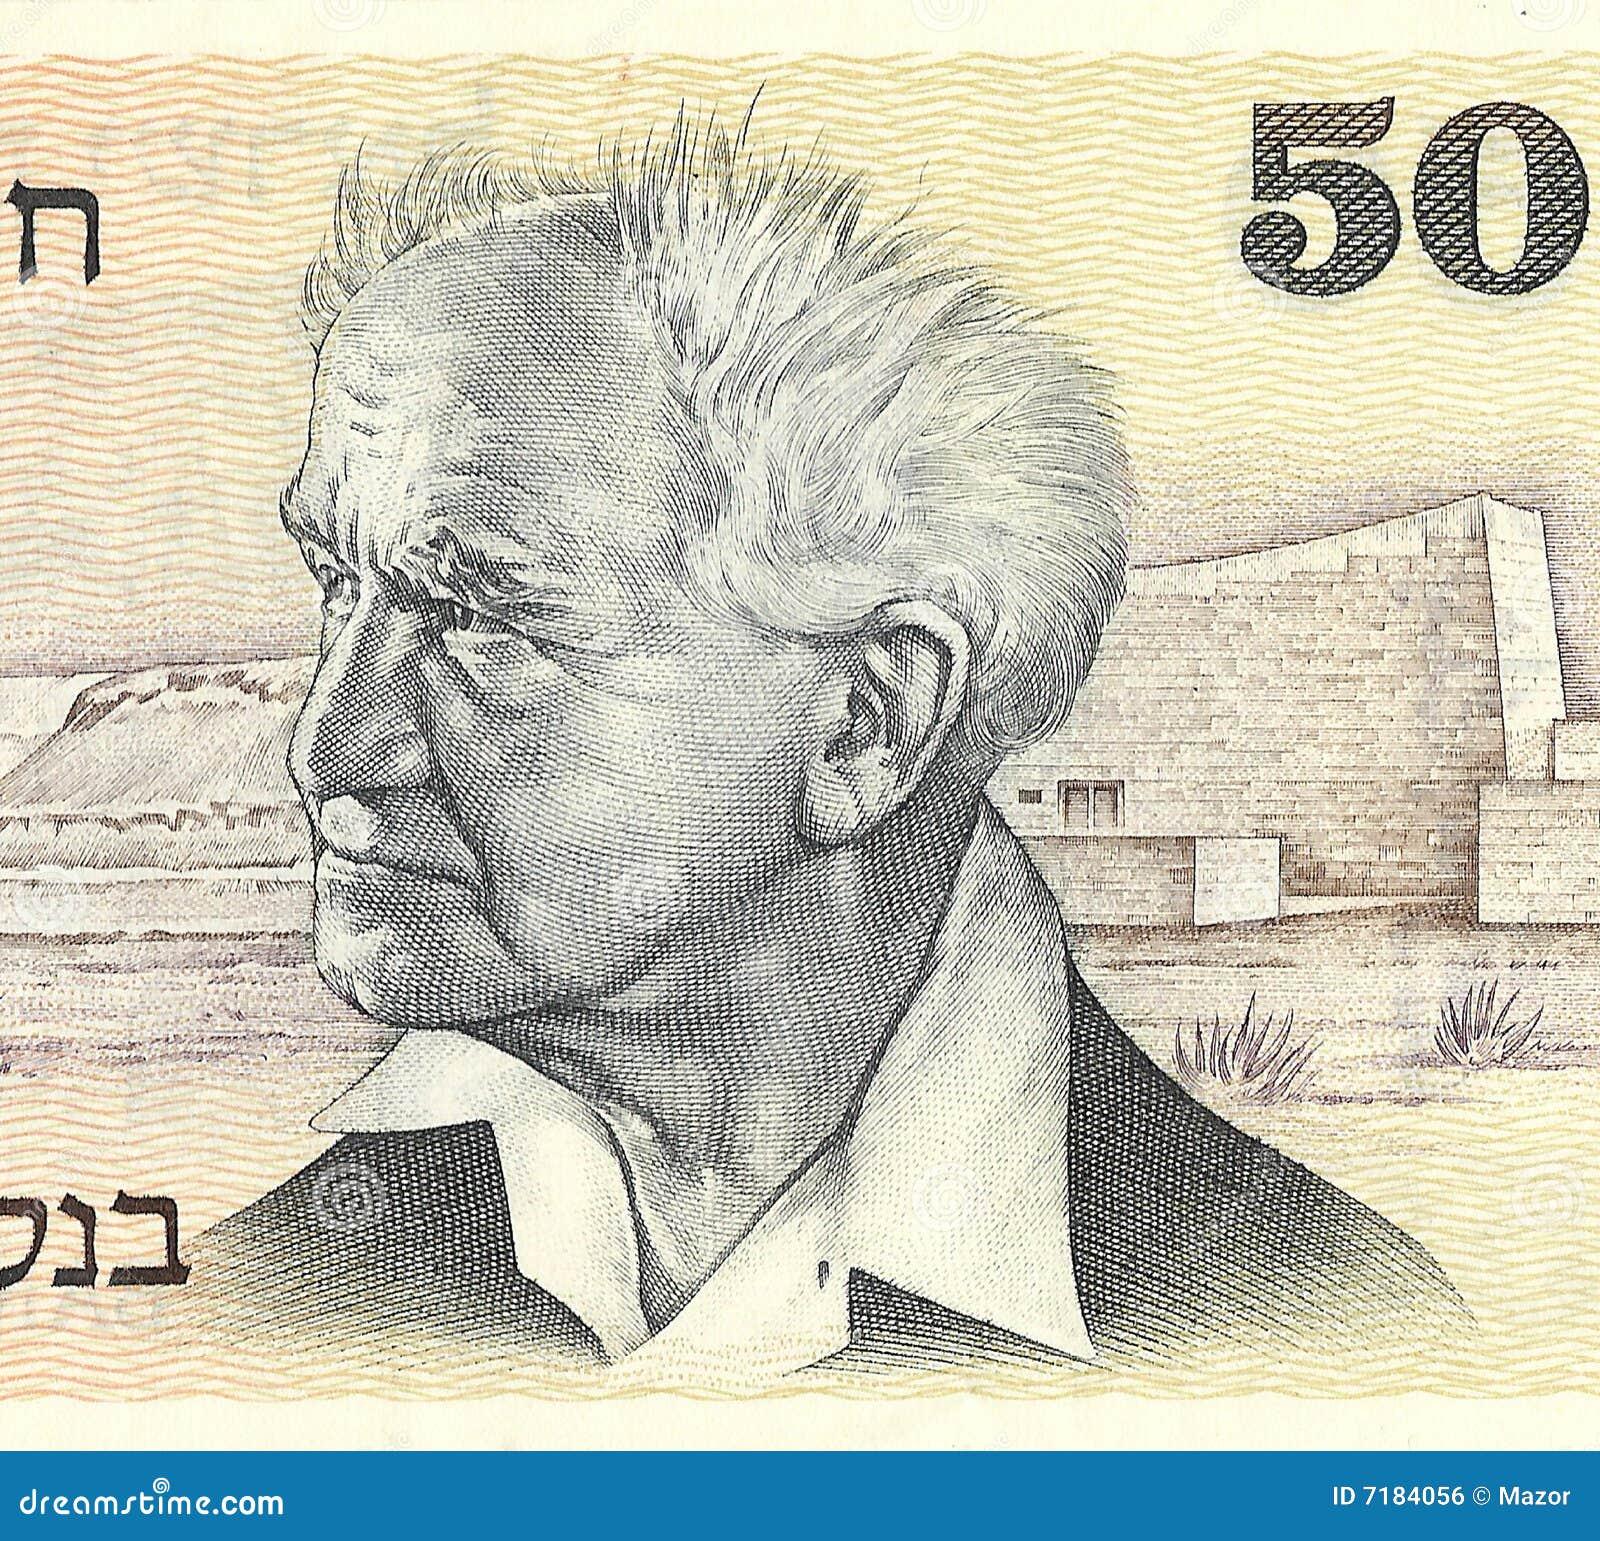 Ben υπουργός του Ισραήλ gurion του Δαβίδ πρώτος πρωταρχικός